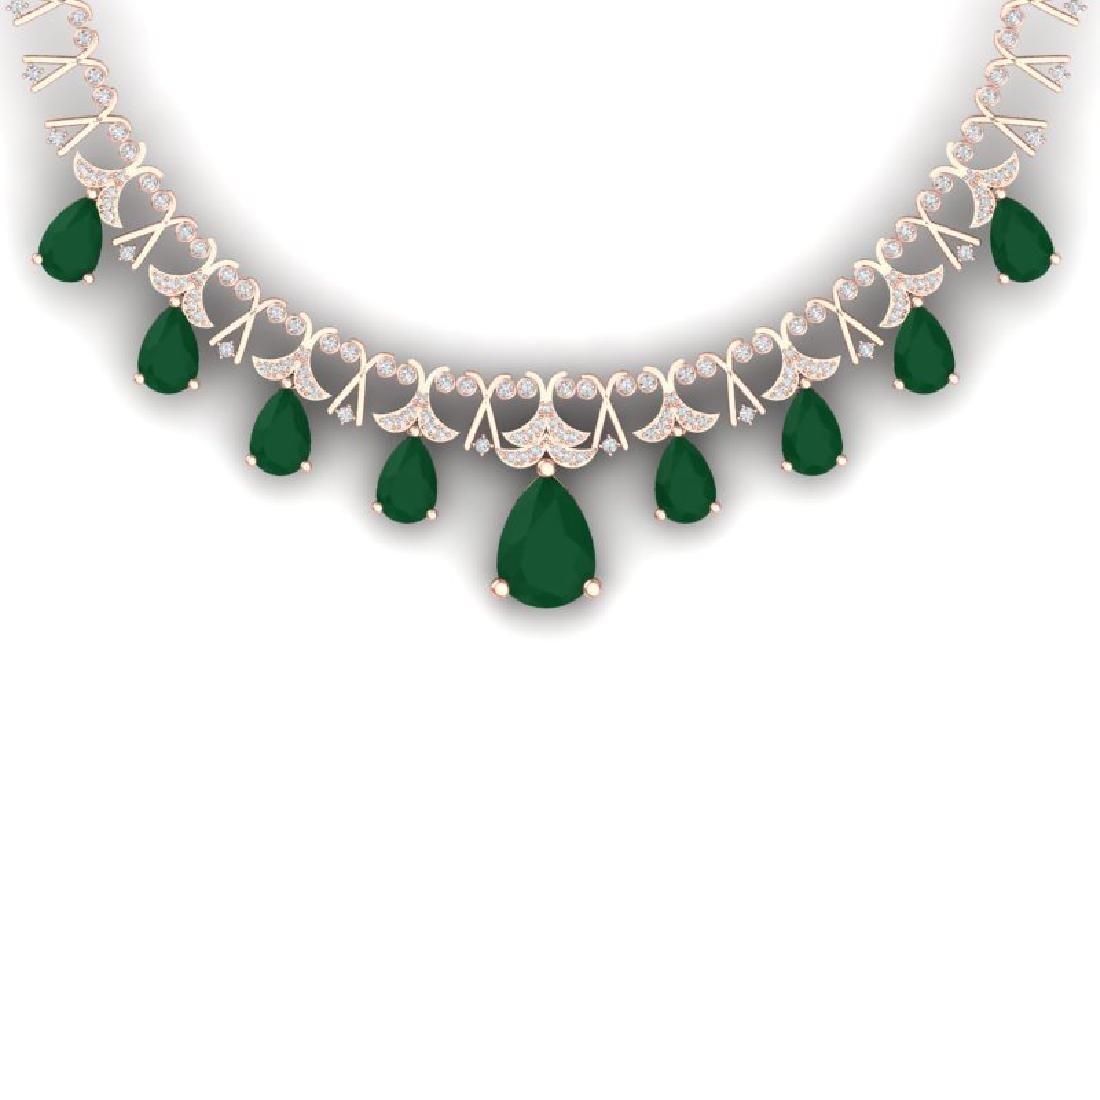 56.94 CTW Royalty Emerald & VS Diamond Necklace 18K